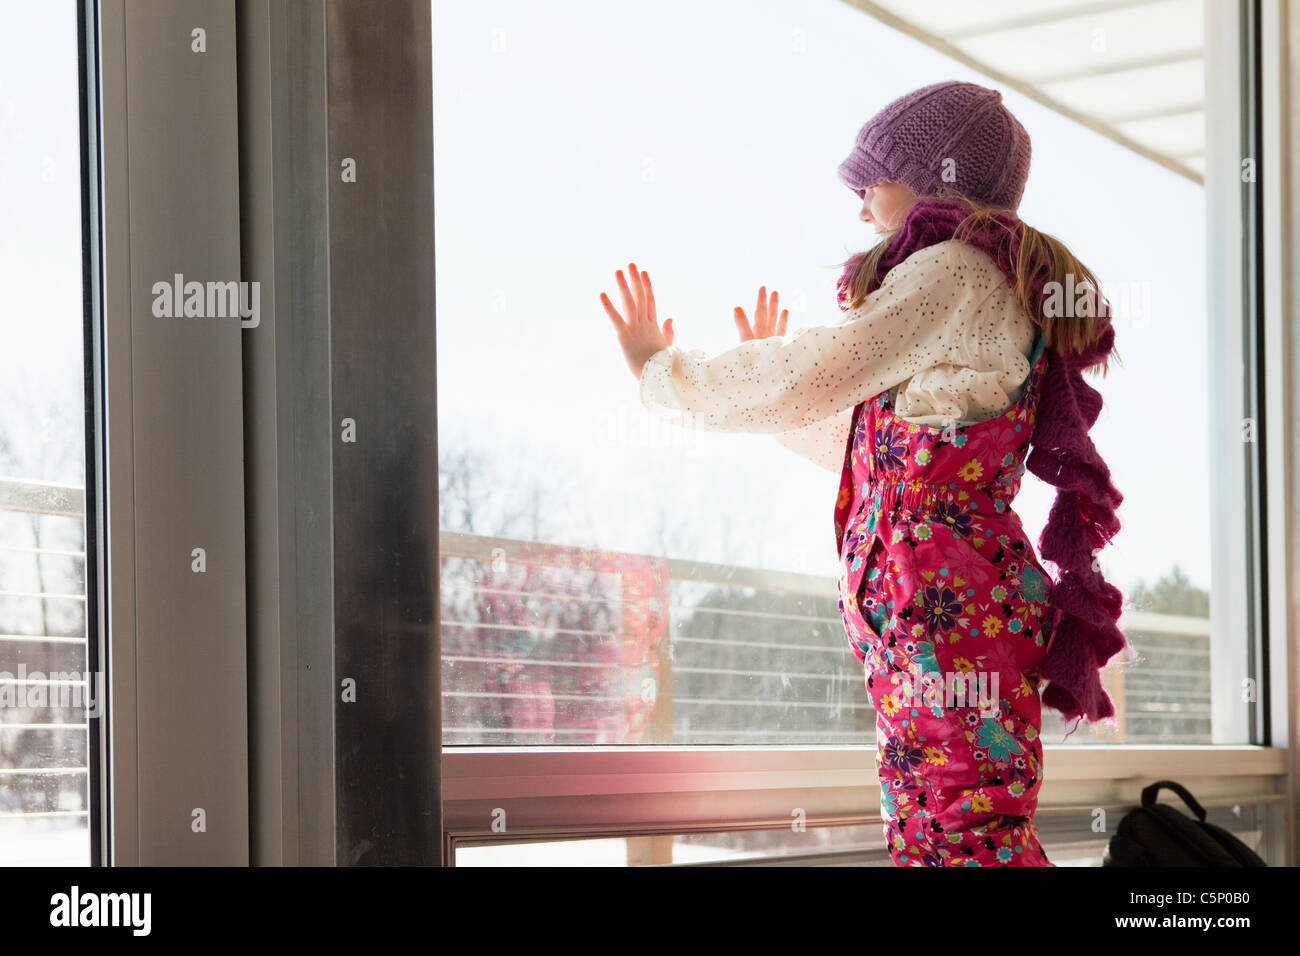 Chica busca a través de la ventana Imagen De Stock